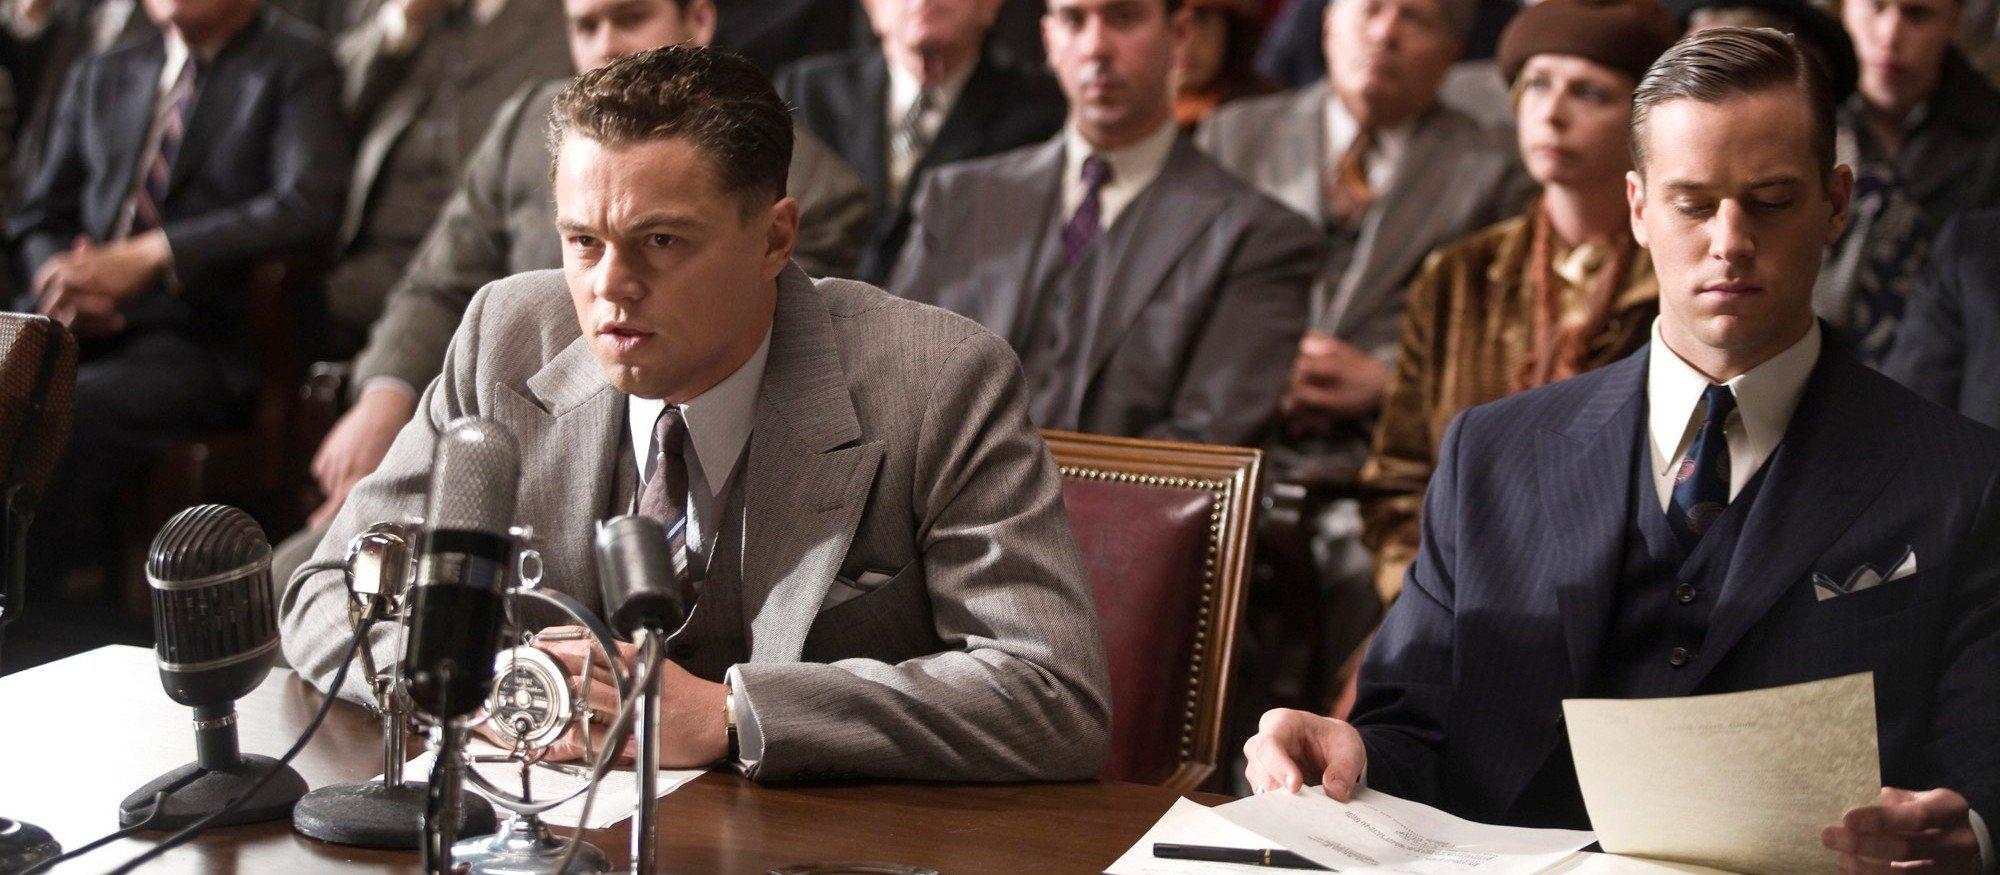 "(L-r) LEONARDO DiCAPRIO as J. Edgar Hoover and ARMIE HAMMER as Clyde Tolson in Warner Bros. Pictures' drama ""J. EDGAR,"" a Warner Bros. Pictures release."